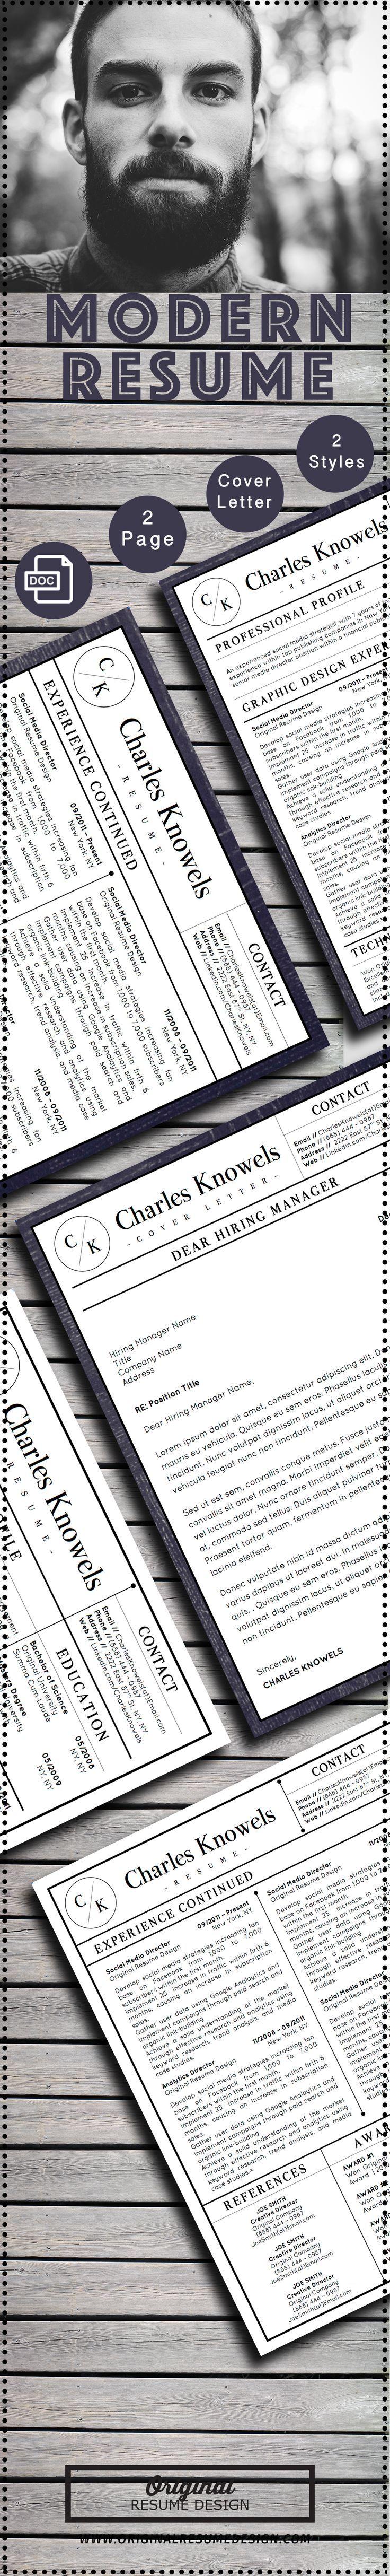 modern resume design that reads almost like a newspaper or menu   resumeideas